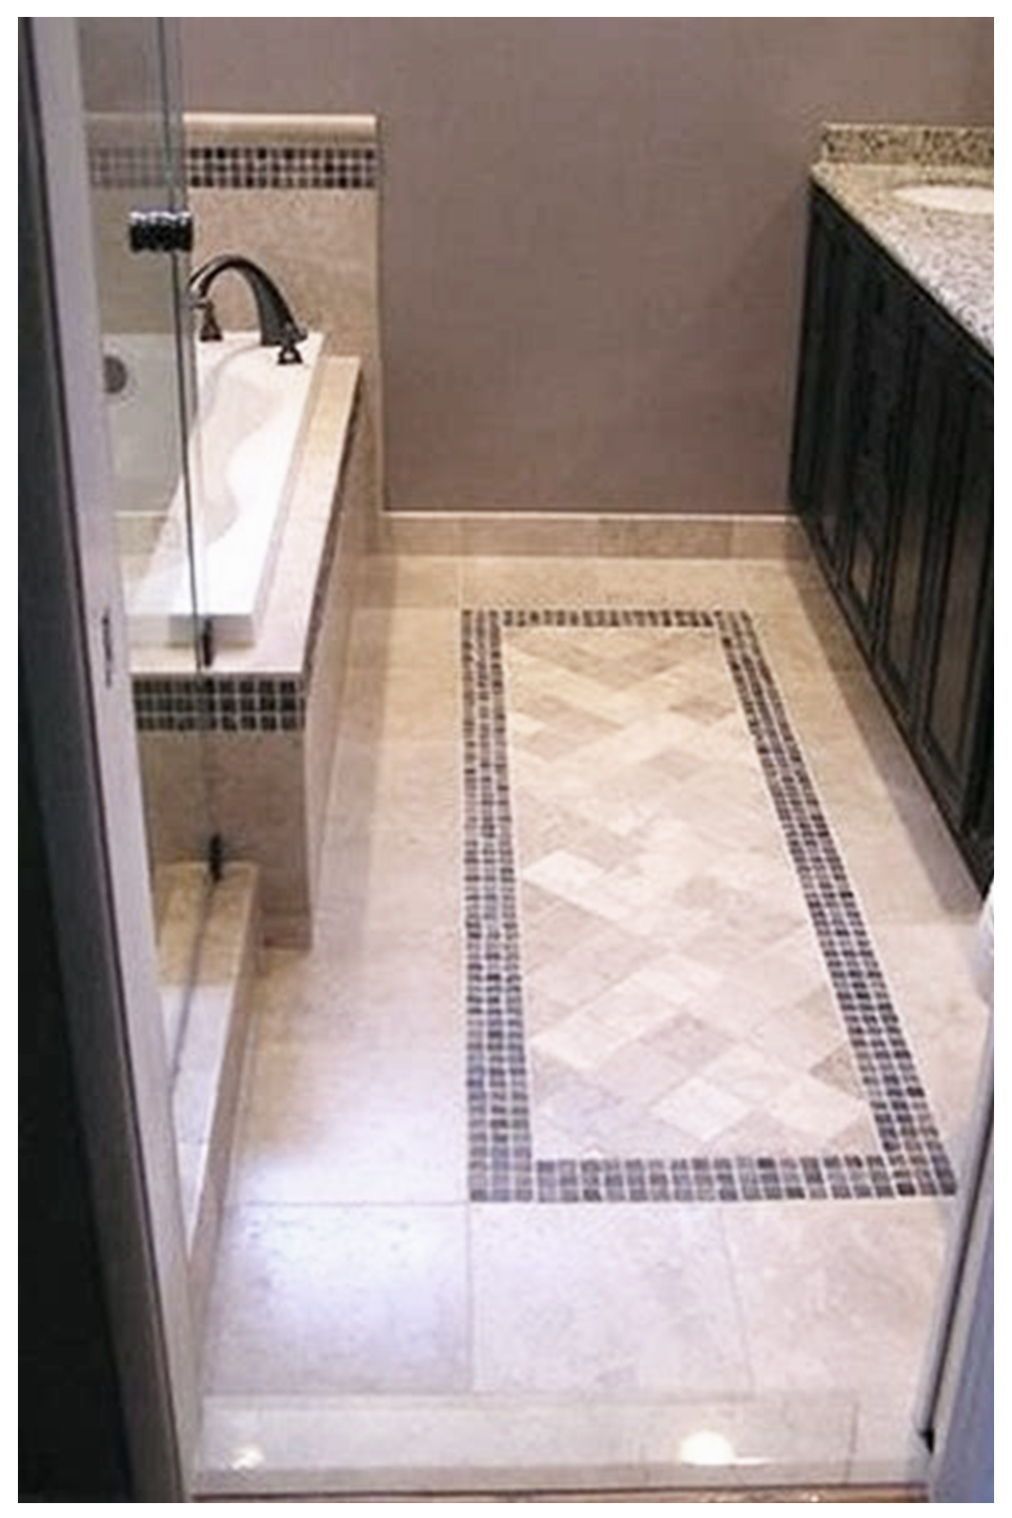 20 Best Bathroom Flooring Design 2020 Galleries Ideas In 2020 Floor Tile Design Bathroom Floor Tiles Bathroom Tile Designs